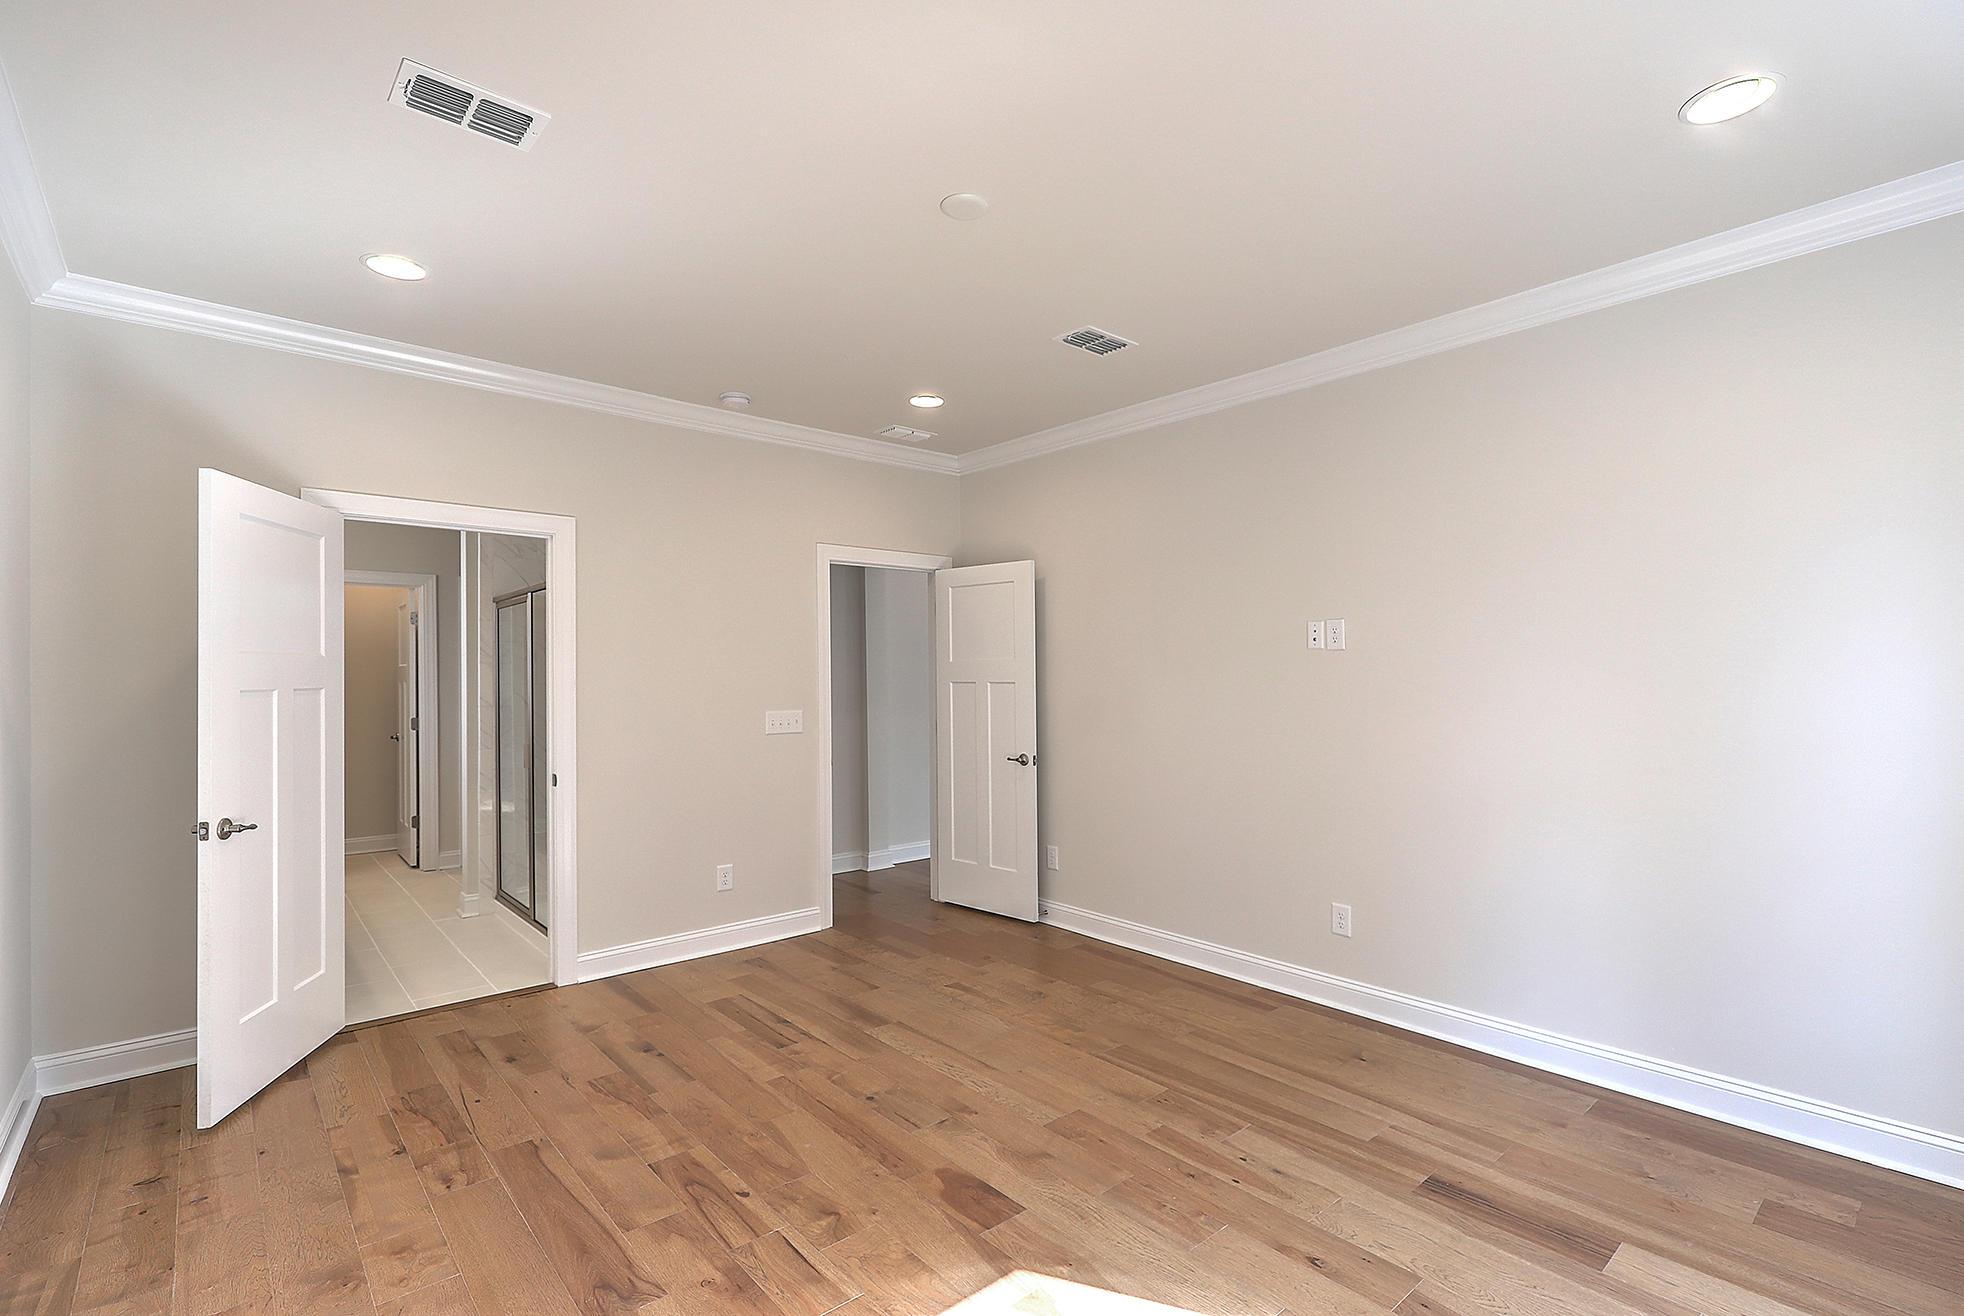 Bentley Park Homes For Sale - 1261 Gannett, Mount Pleasant, SC - 4